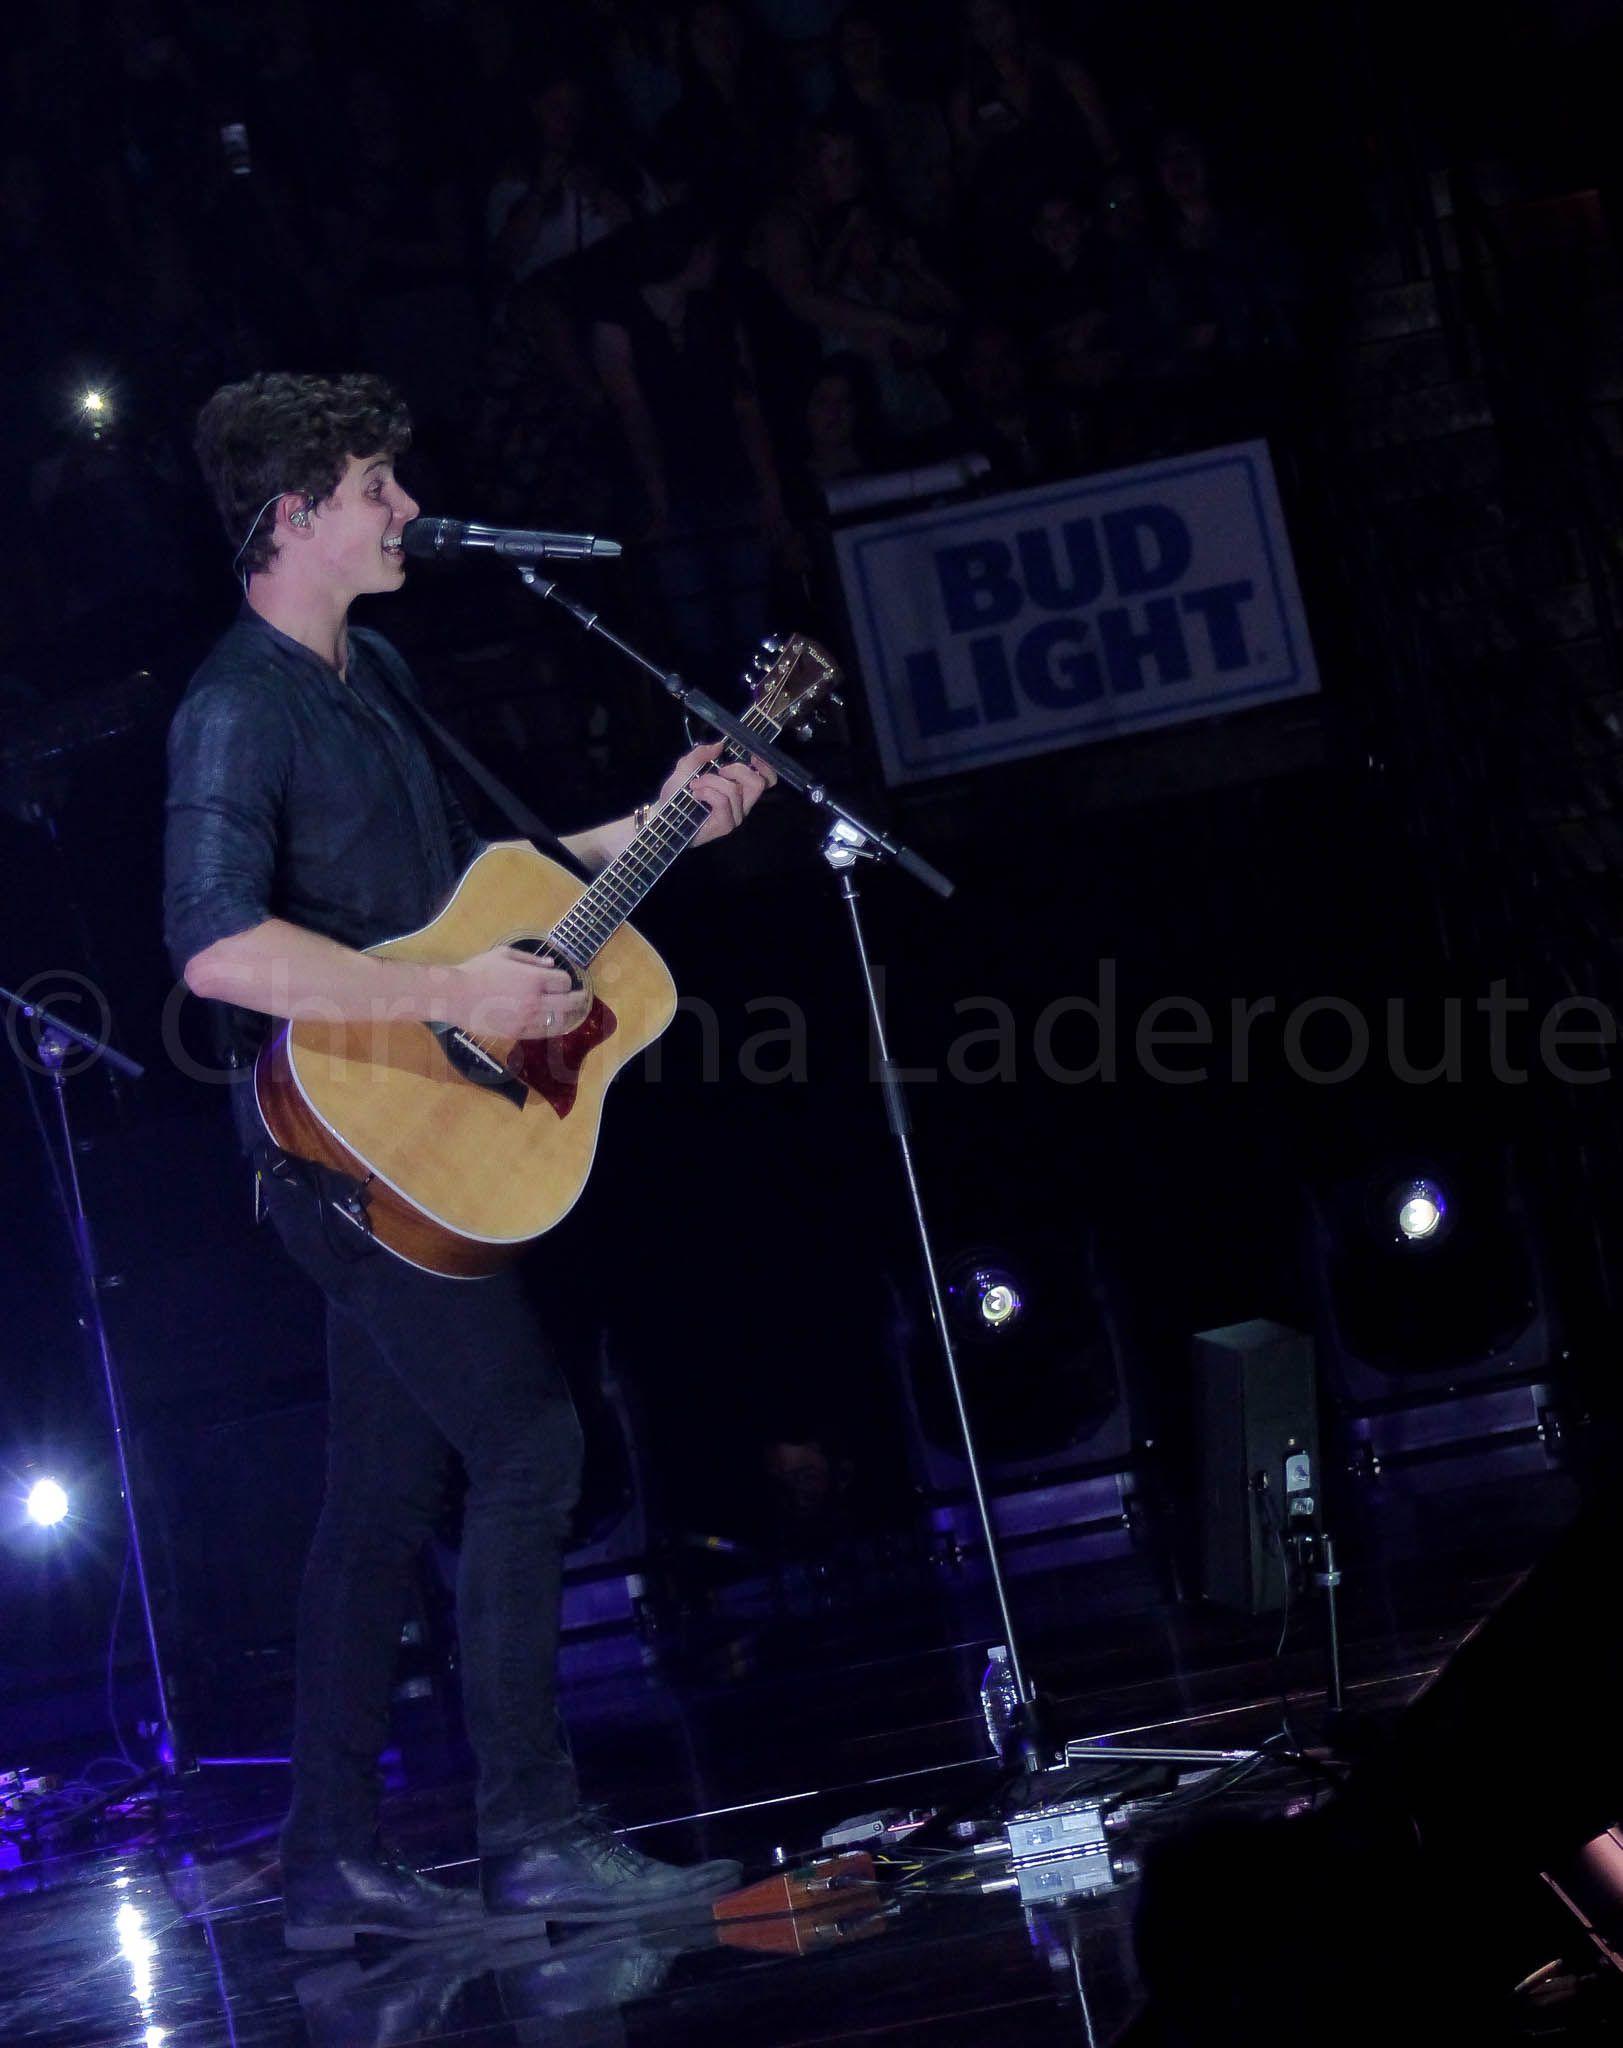 Shawn Mendes 8 23 2017 TD Garden Boston MA instagram